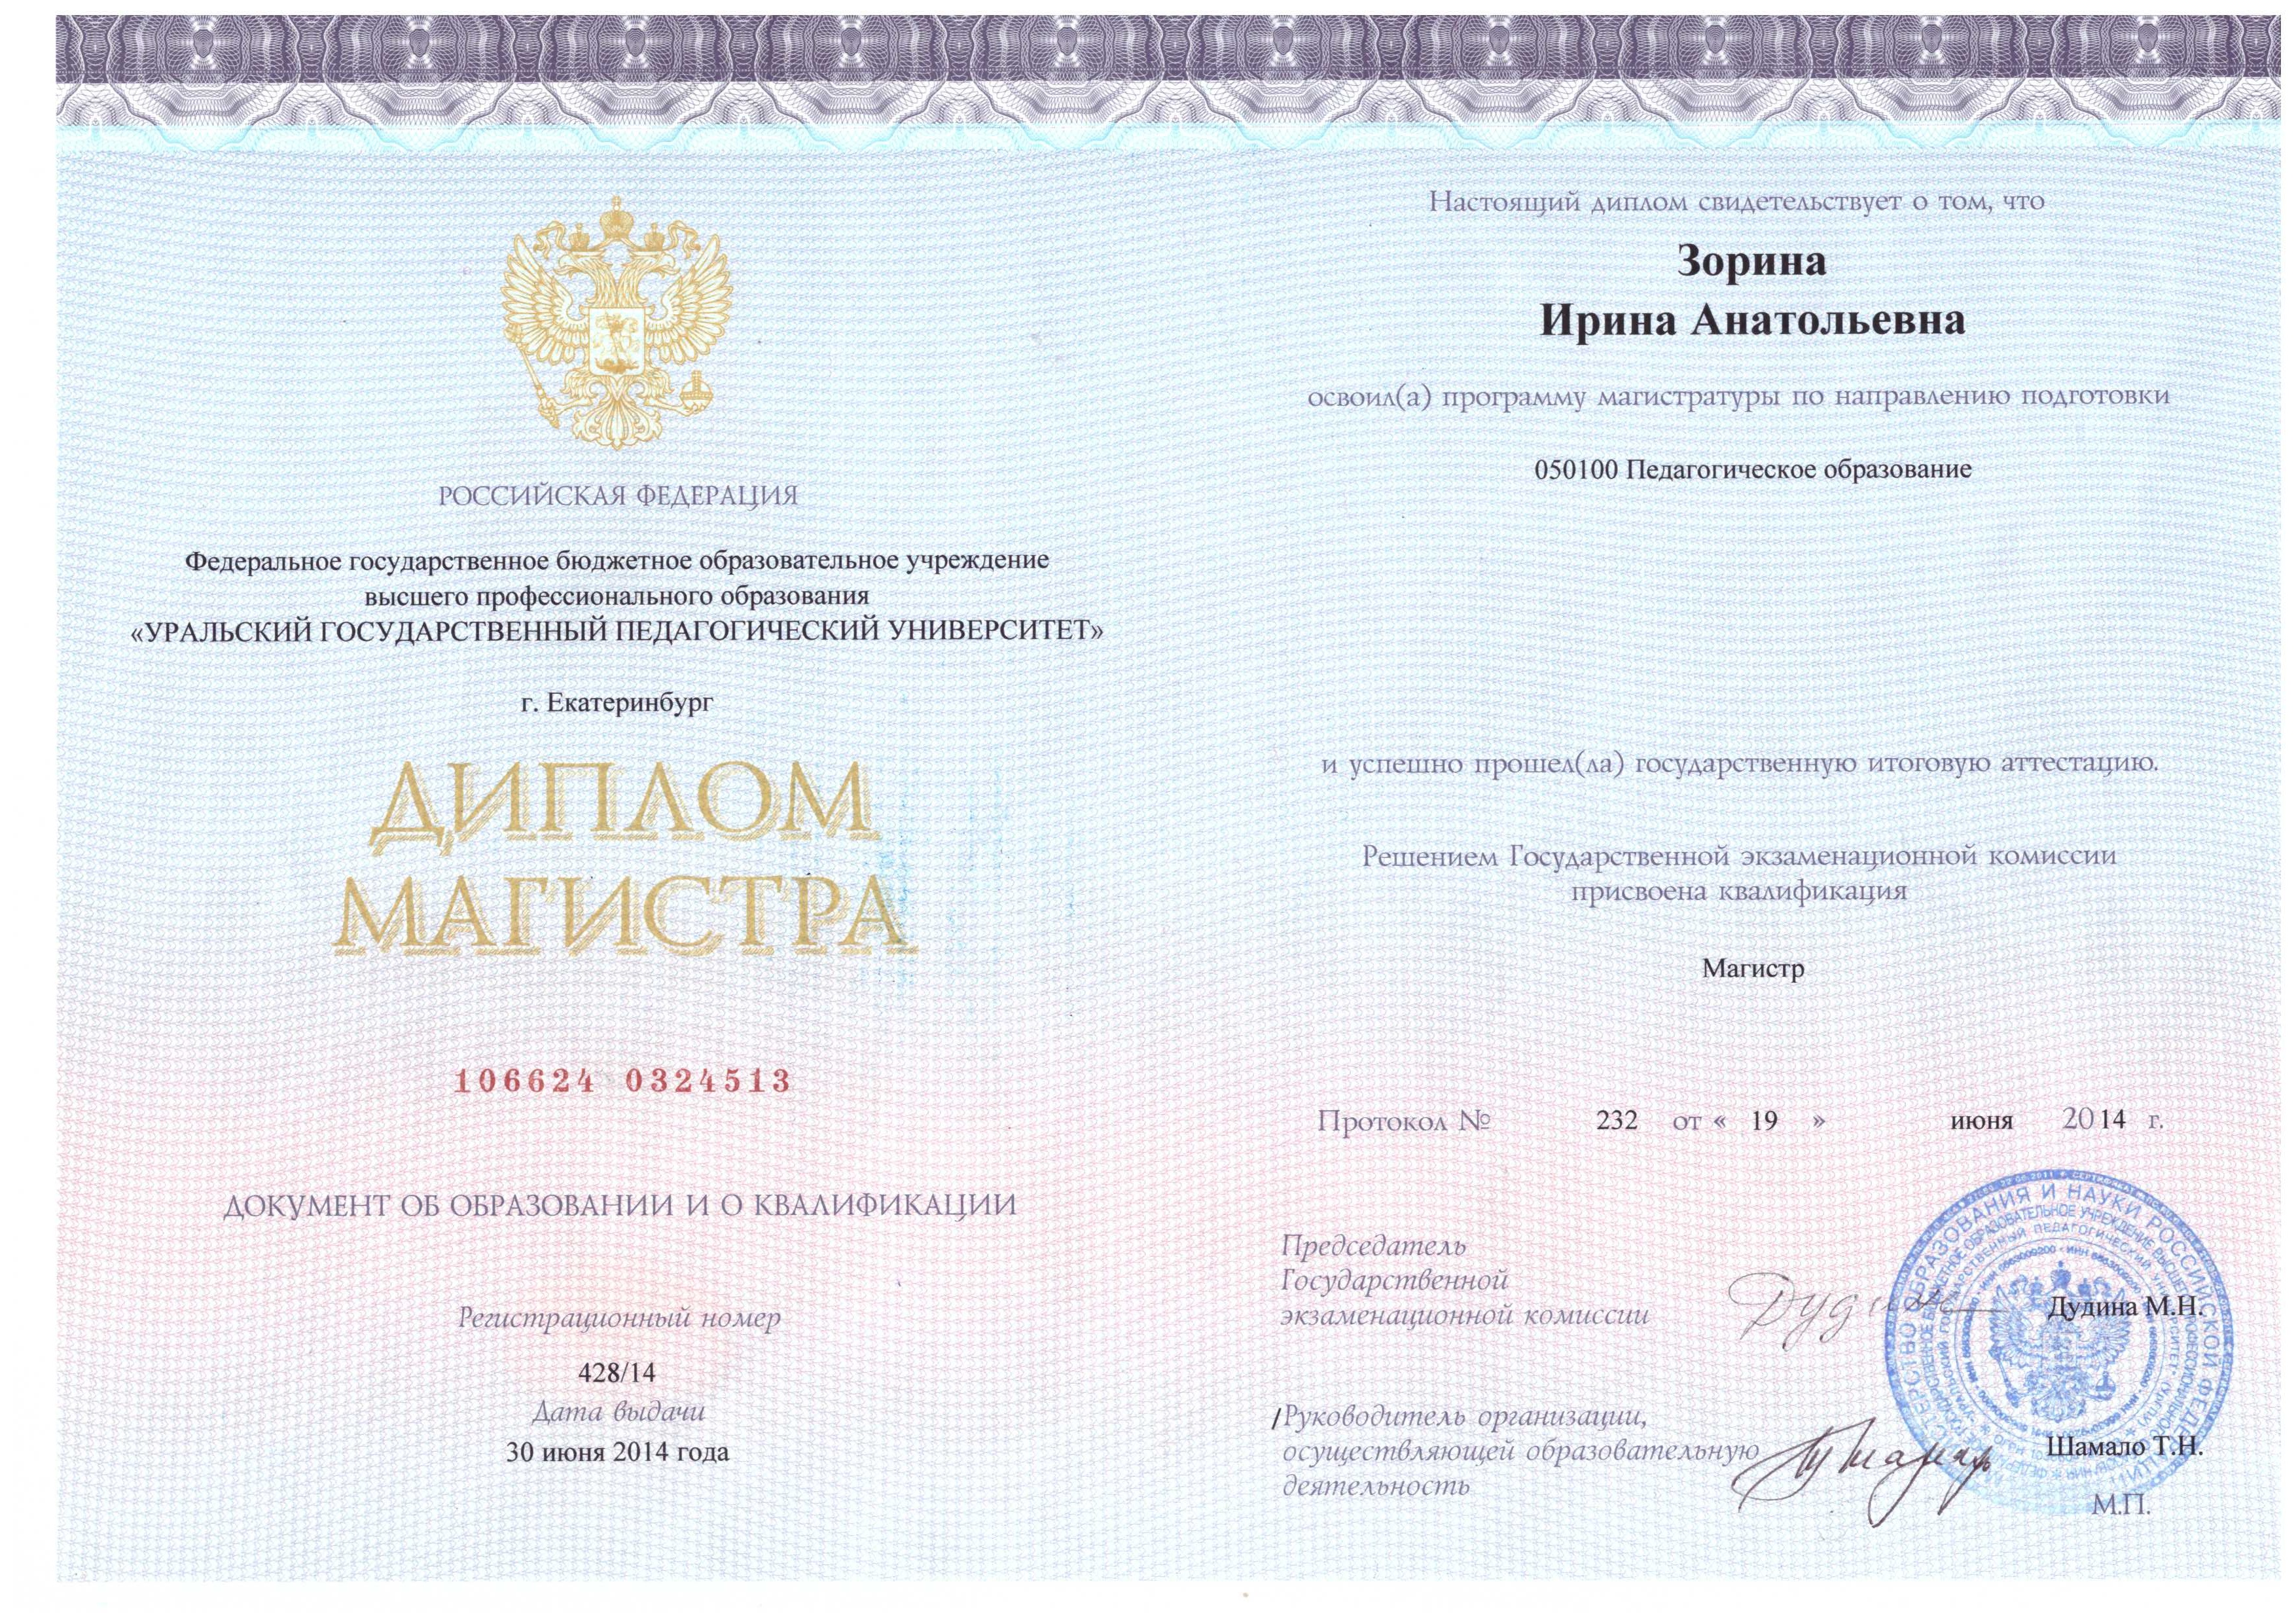 scaned_document-15-42-53.pdf-0